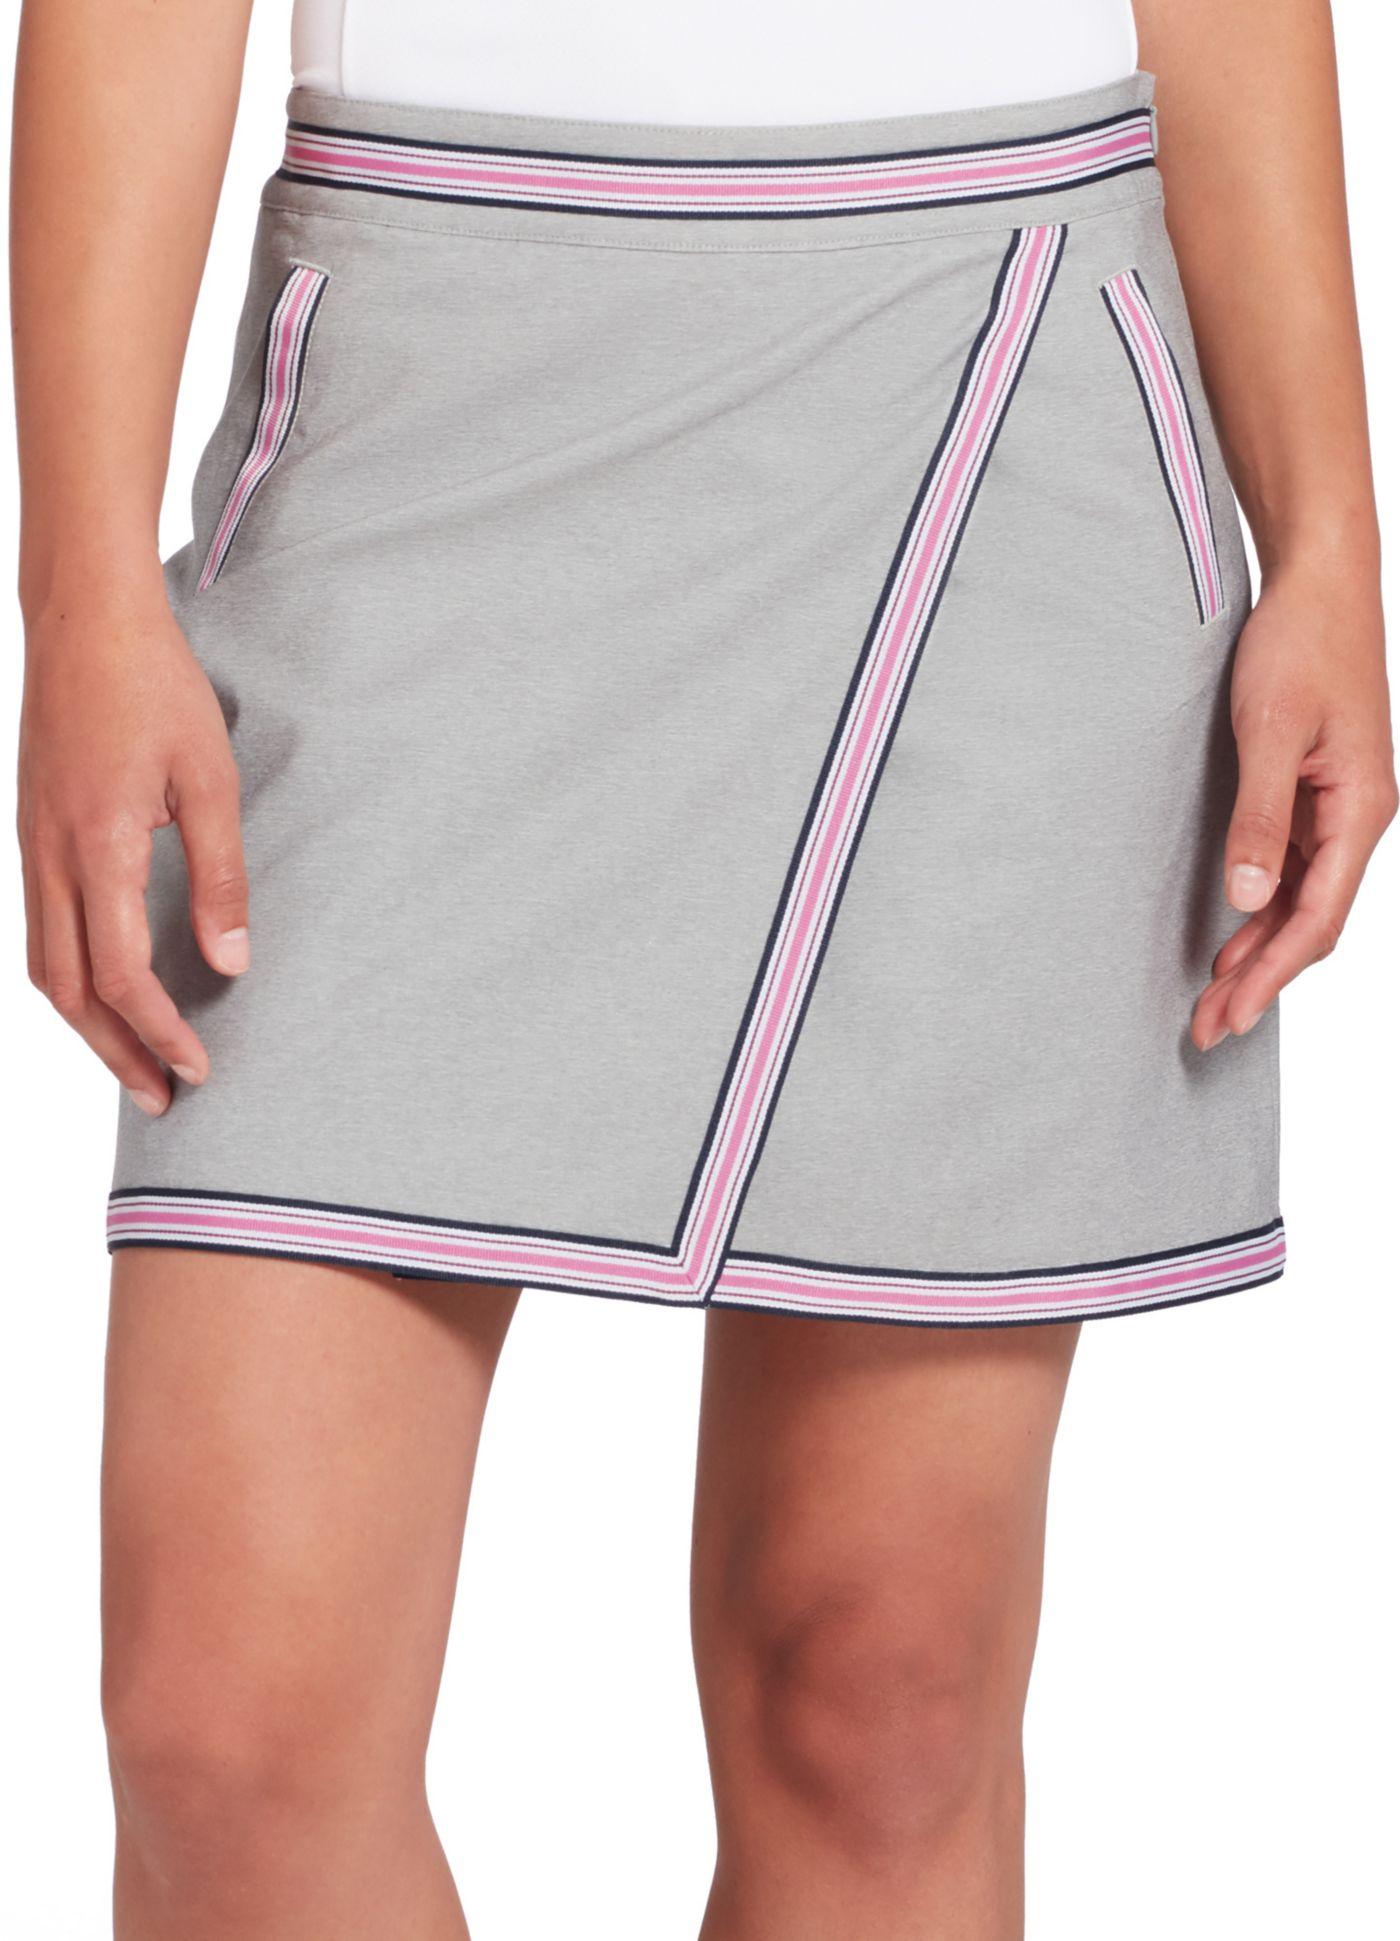 Lady Hagen Women's Wrap Golf Skort